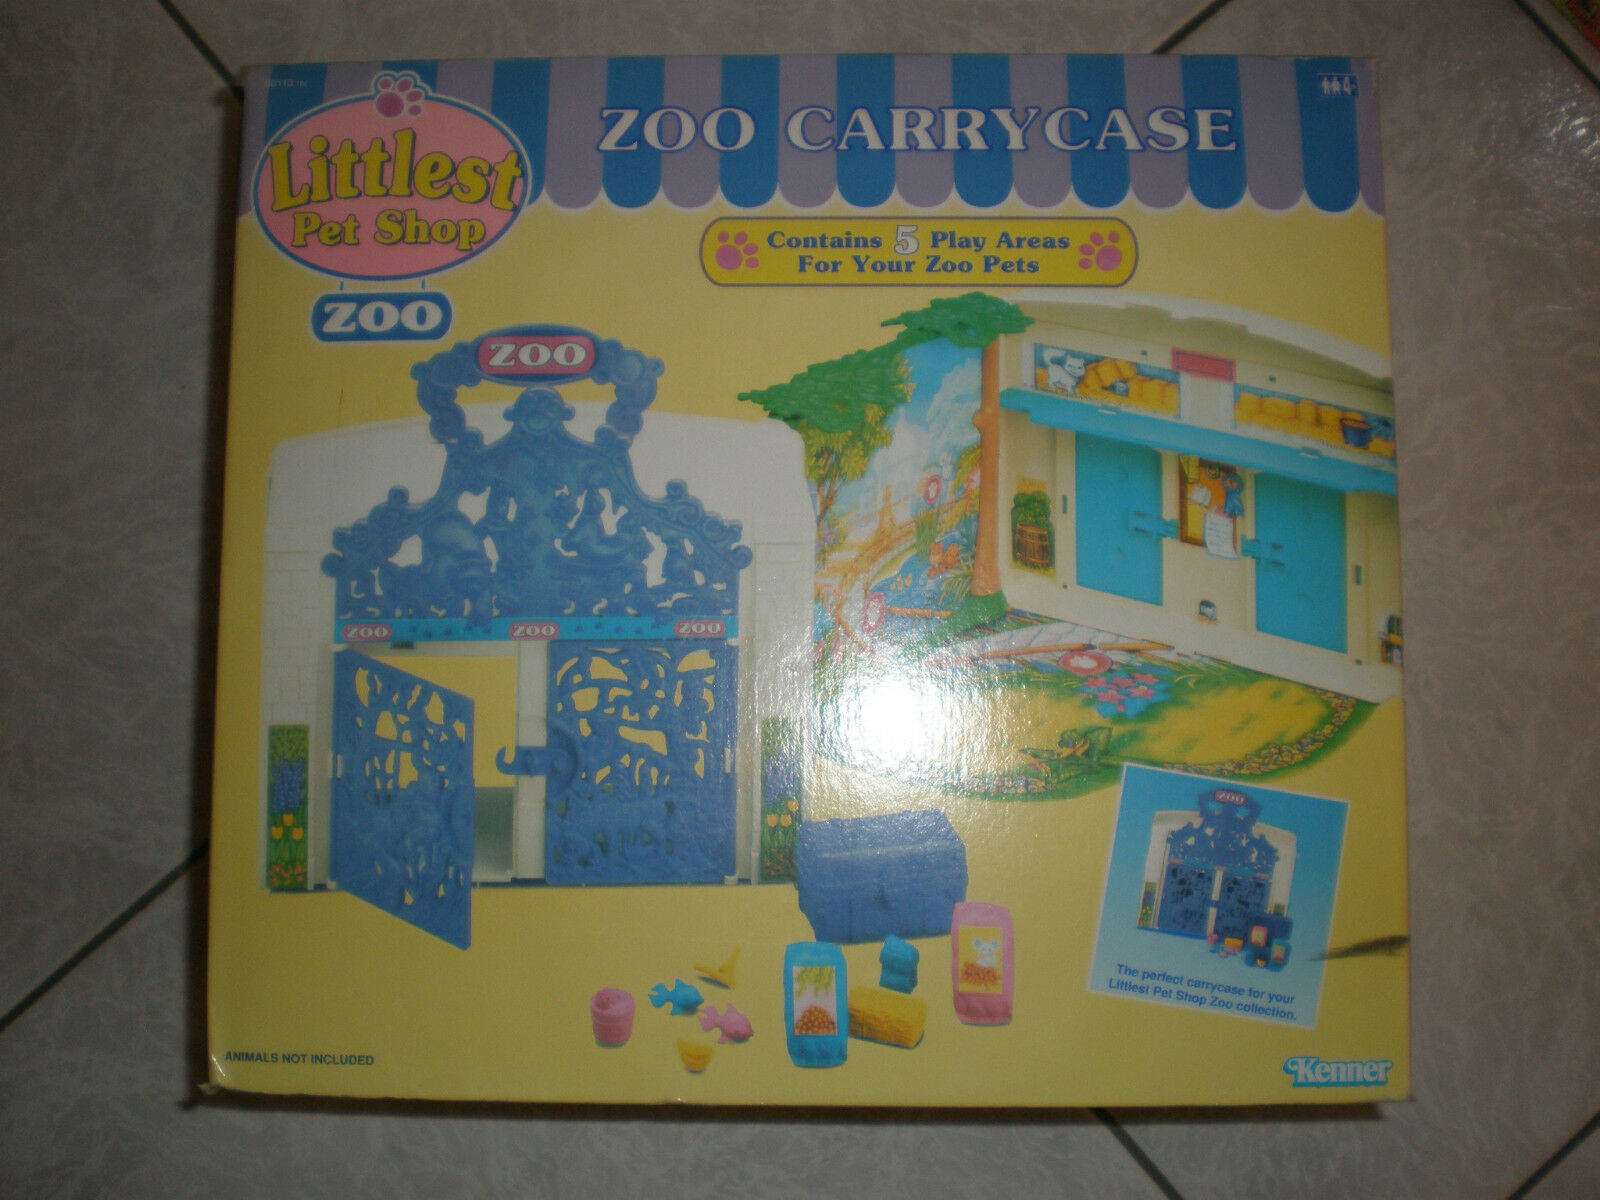 1994 KENNER LITTLEST PET SHOP ZOO CARRY CASE MIB HUGE